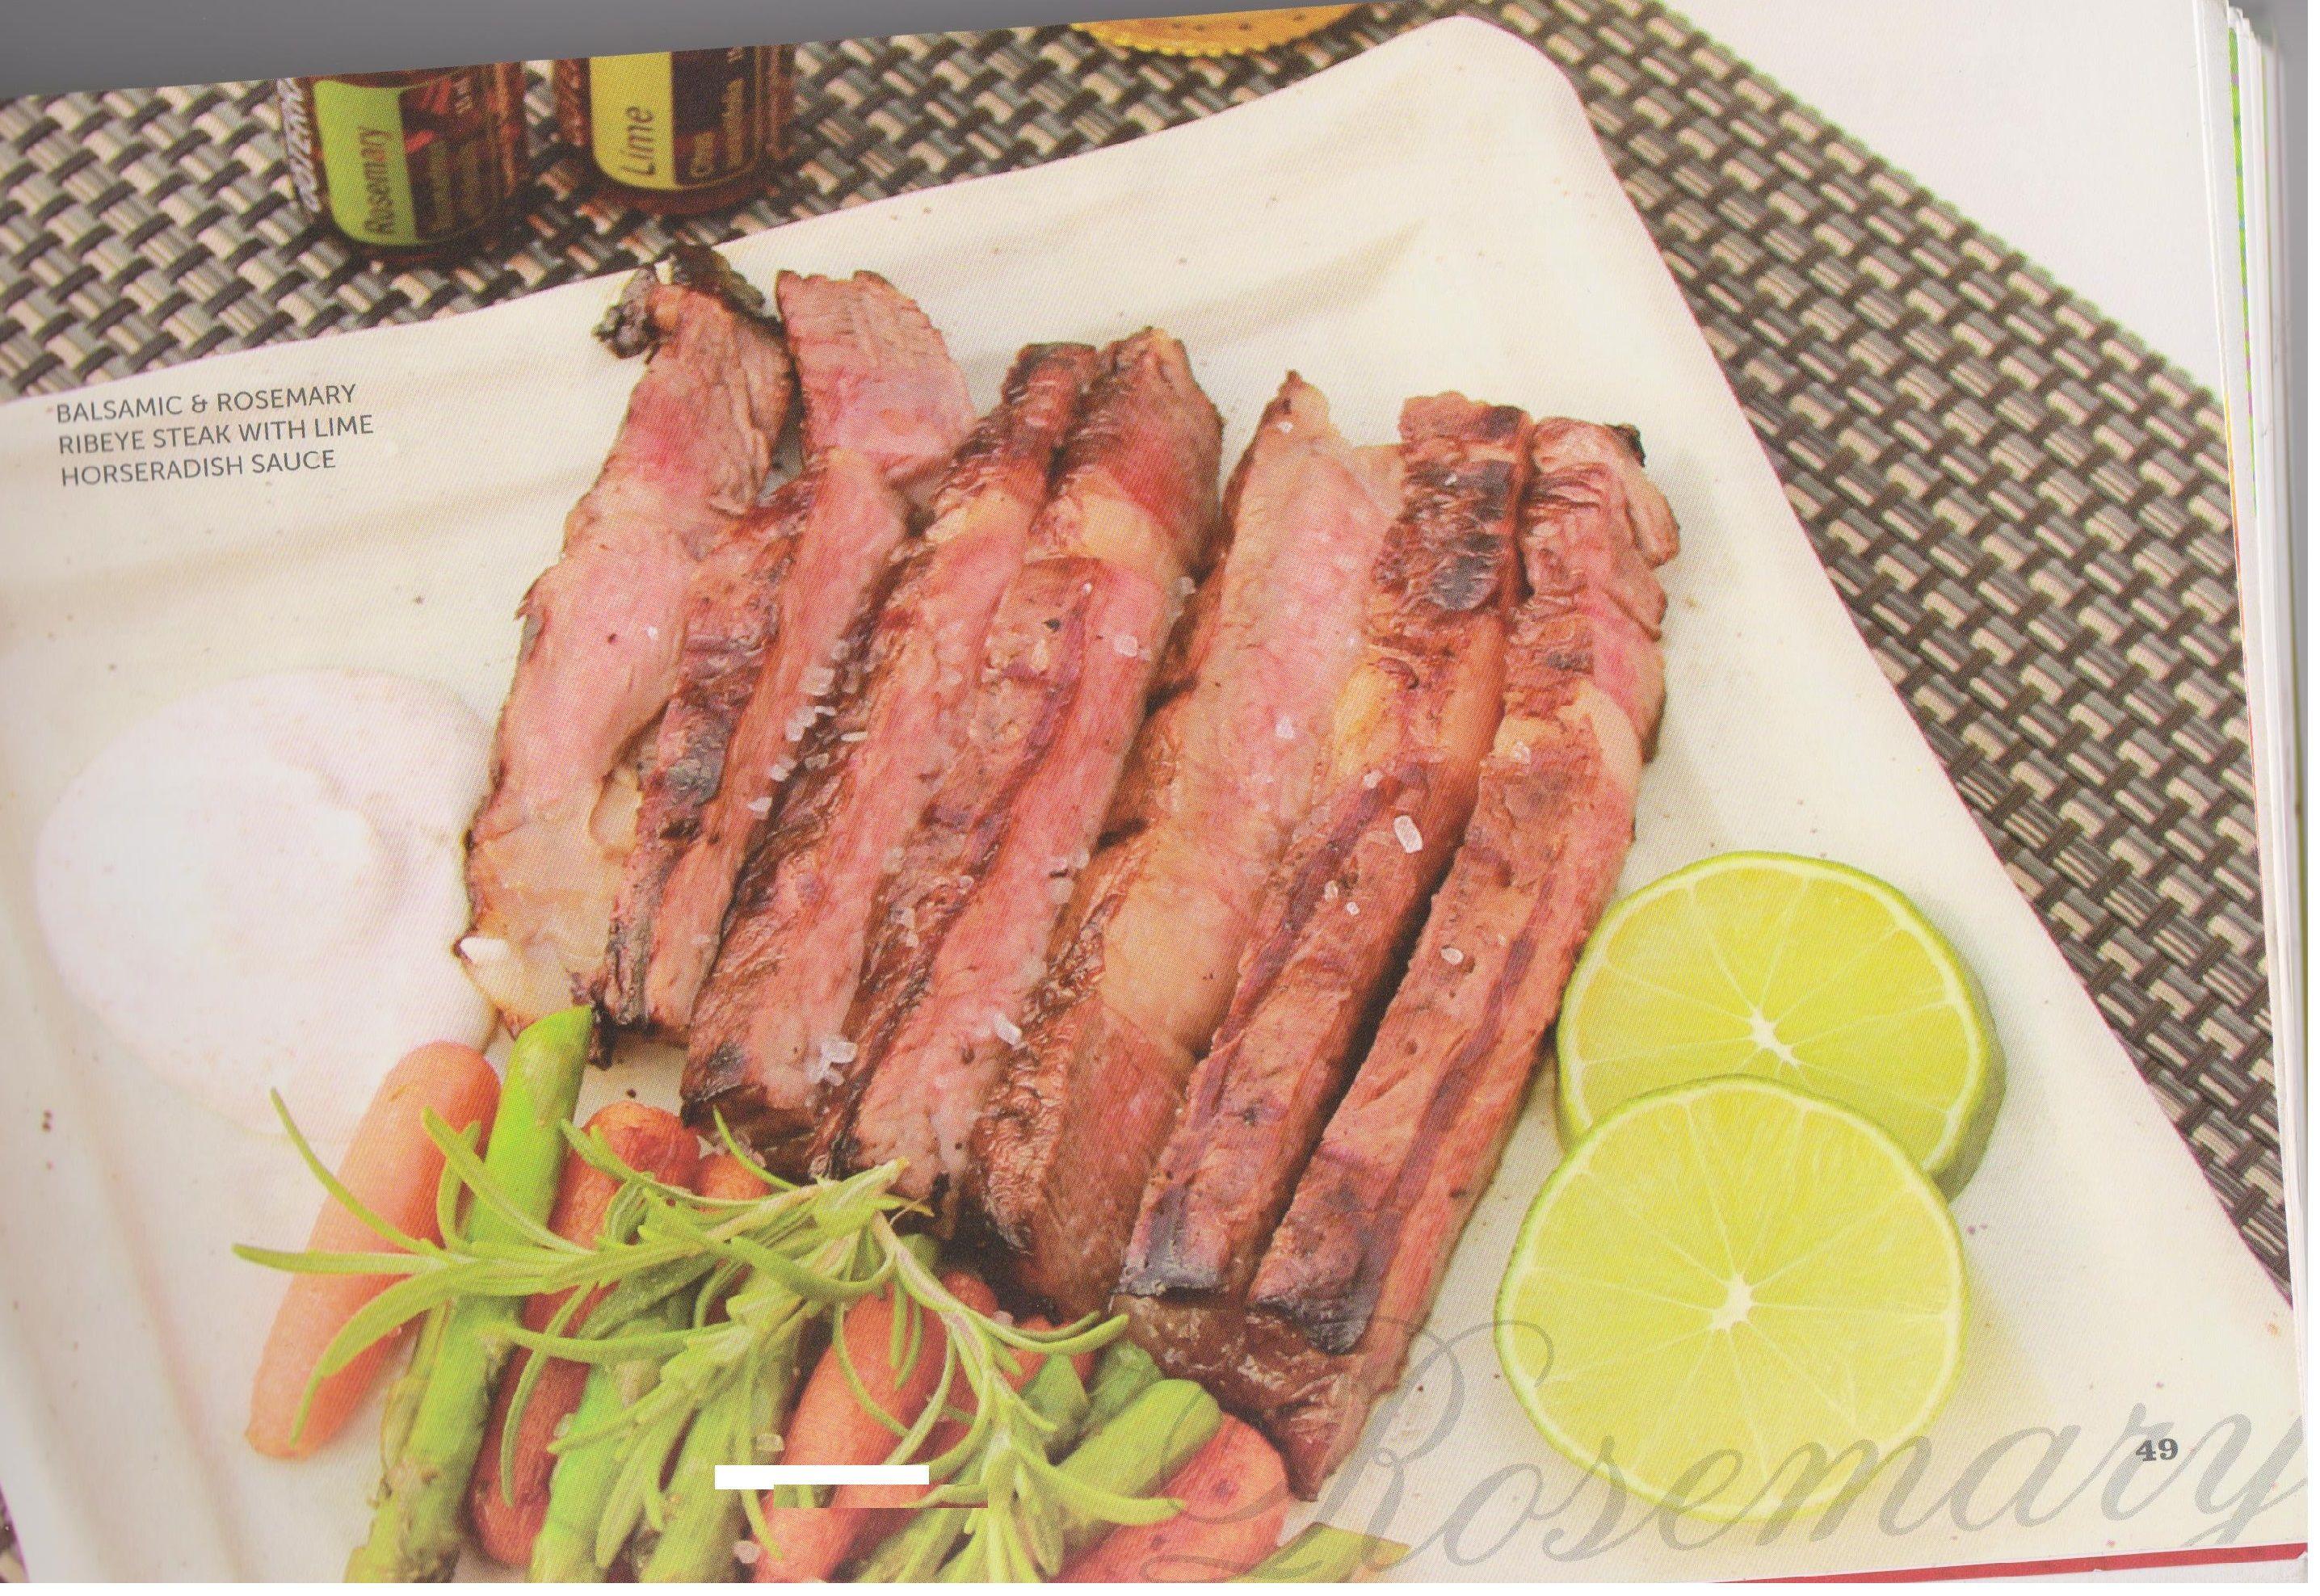 Balsamic & Rosemary ribeye steak  Med Lime peberrod sauce Dette møre og smagsmæssige steak kombineret med Rosemary og Lime æteriske olier er en familie favorit. mere på web http://www.deeptouch.info/#!balsamic--rosemary-ribeye-steak/c15jd